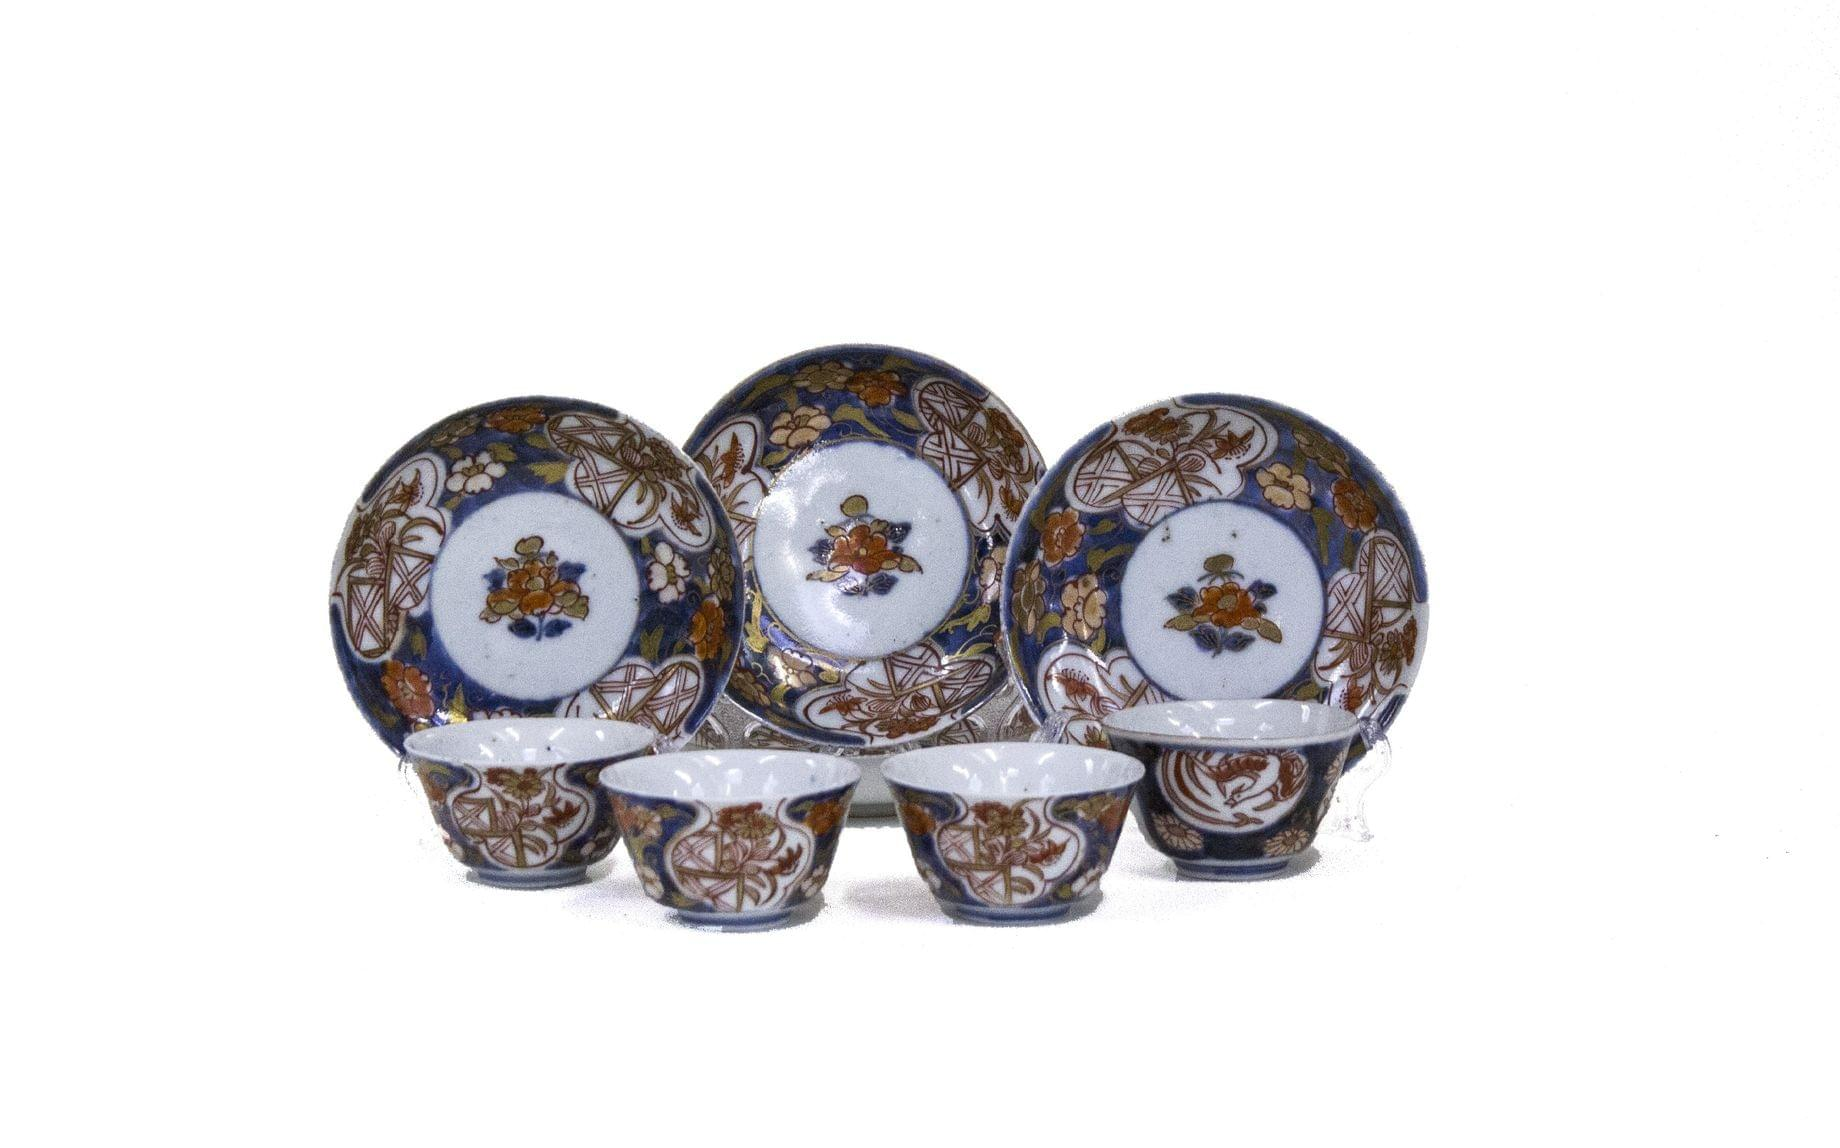 4 tasses et soucoupes, Imari, Chine, XVIIIe s